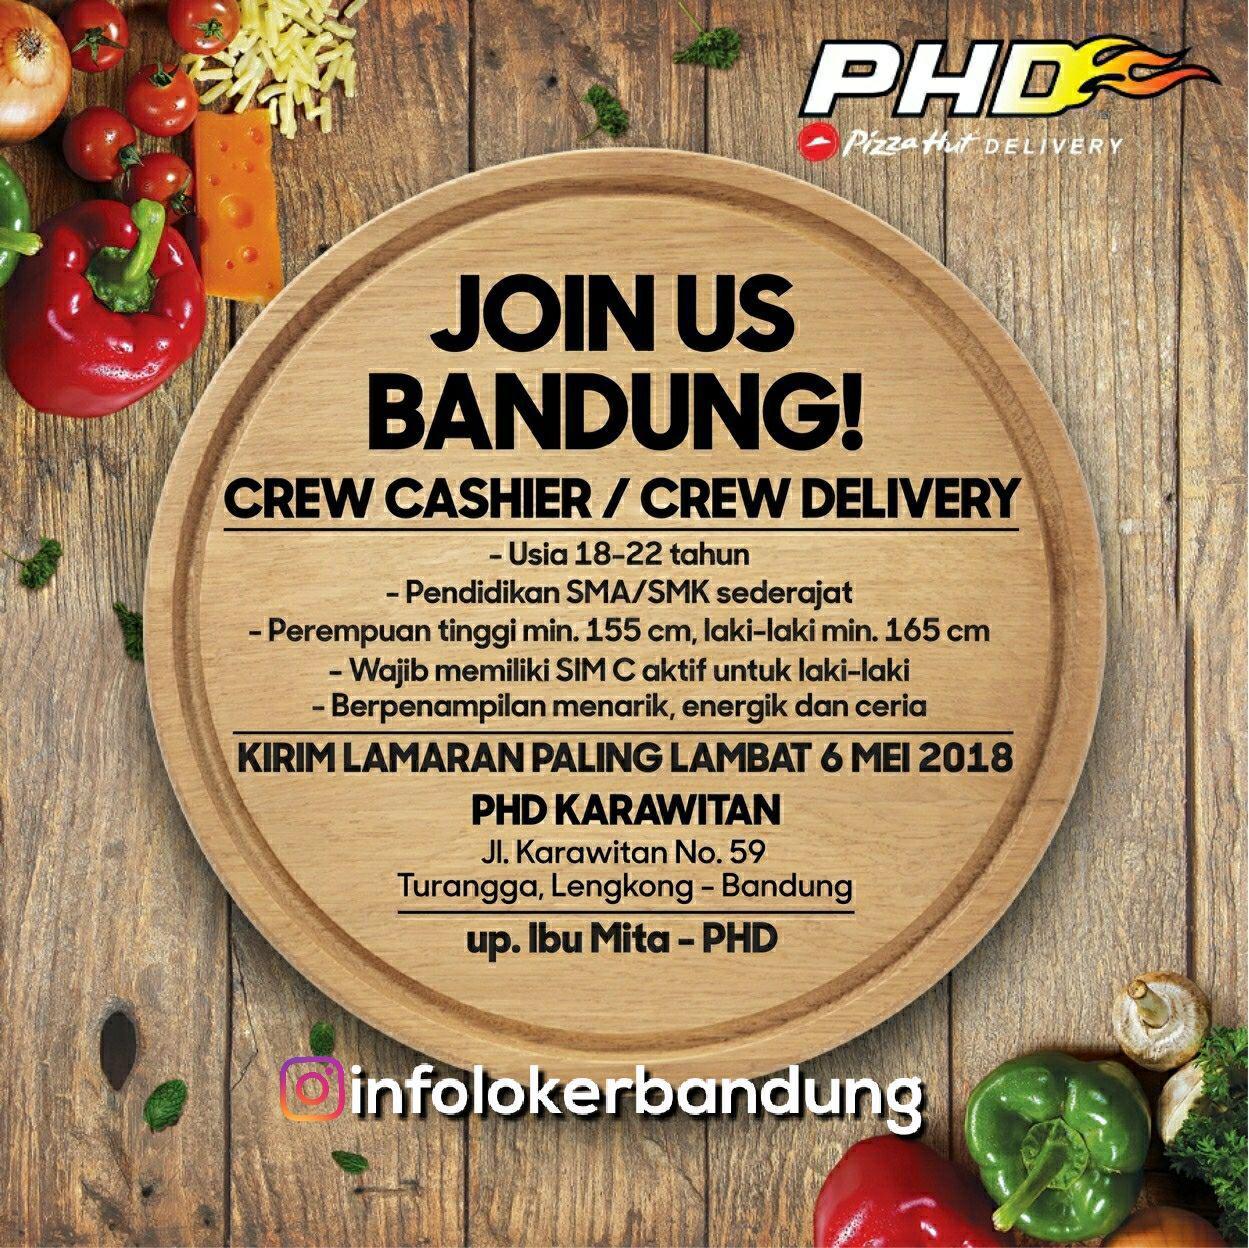 Lowongan Kerja Pizza Hut Delivery ( PHD ) Karawitan Bandung Mei 2018